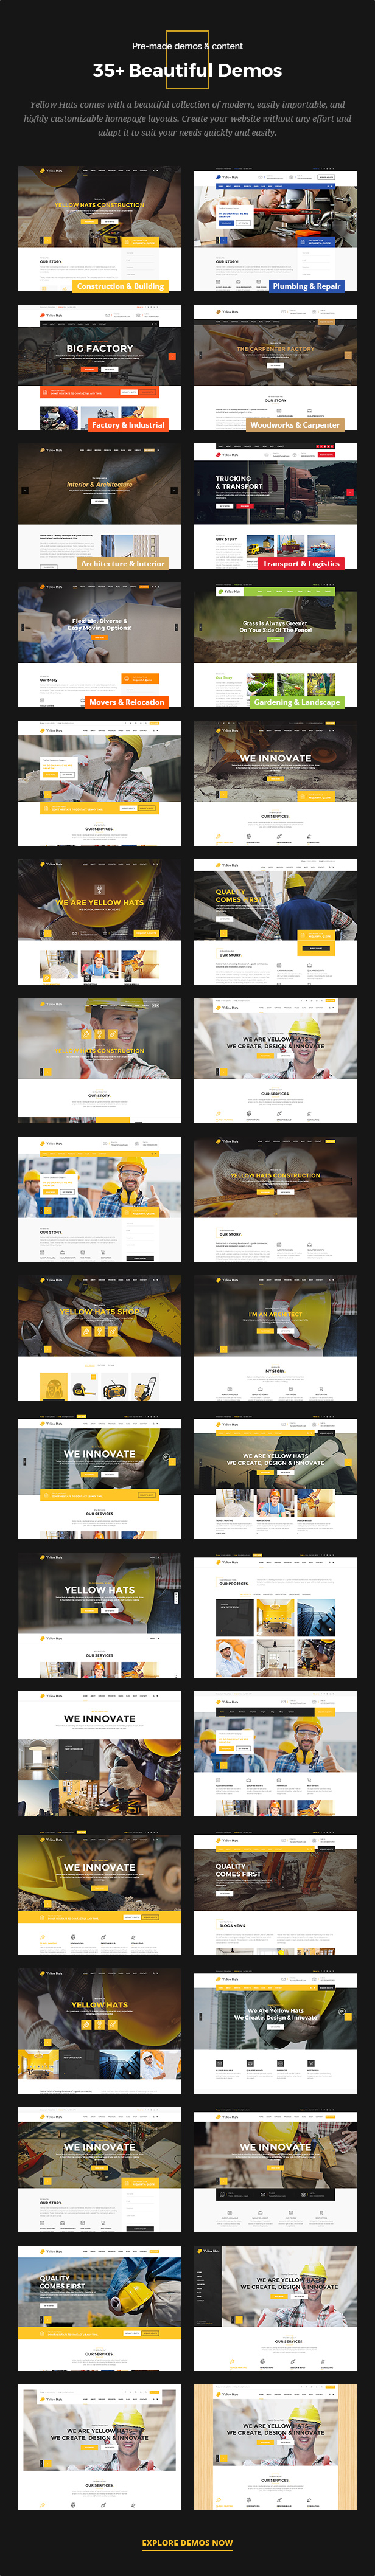 Yellow Hats - Construction, Building & Renovation Theme - 5